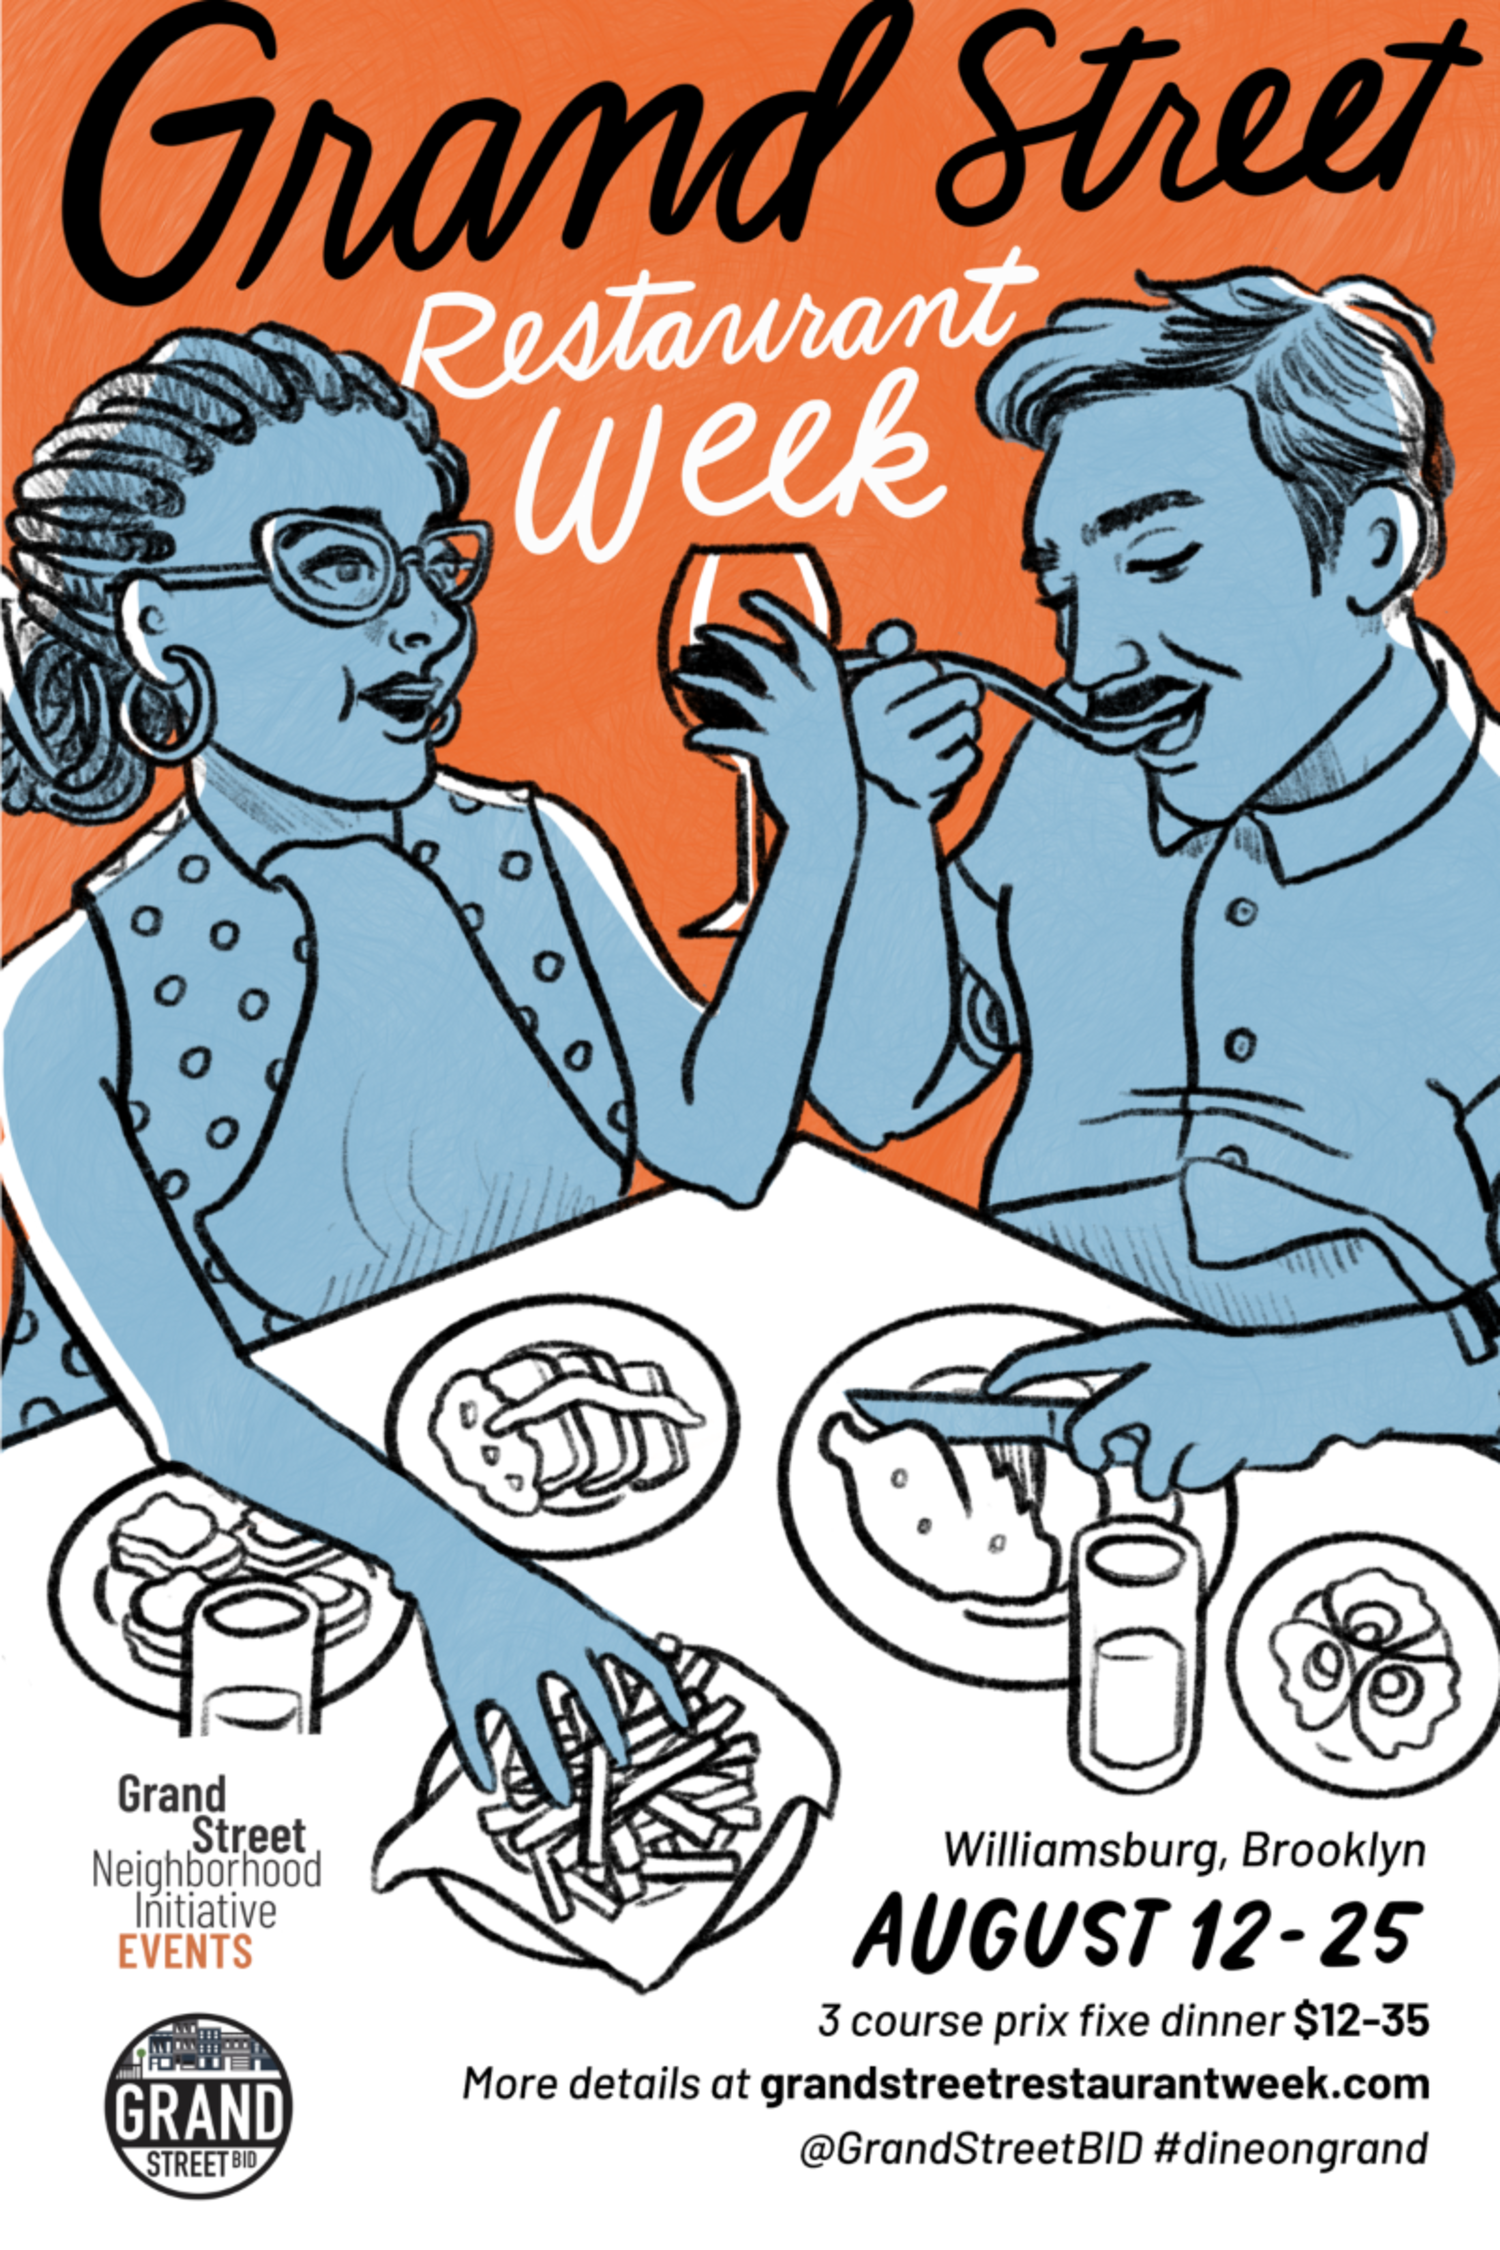 Grand Street Restaurant Week, Winter 2019, Feb 18th — March 3rd